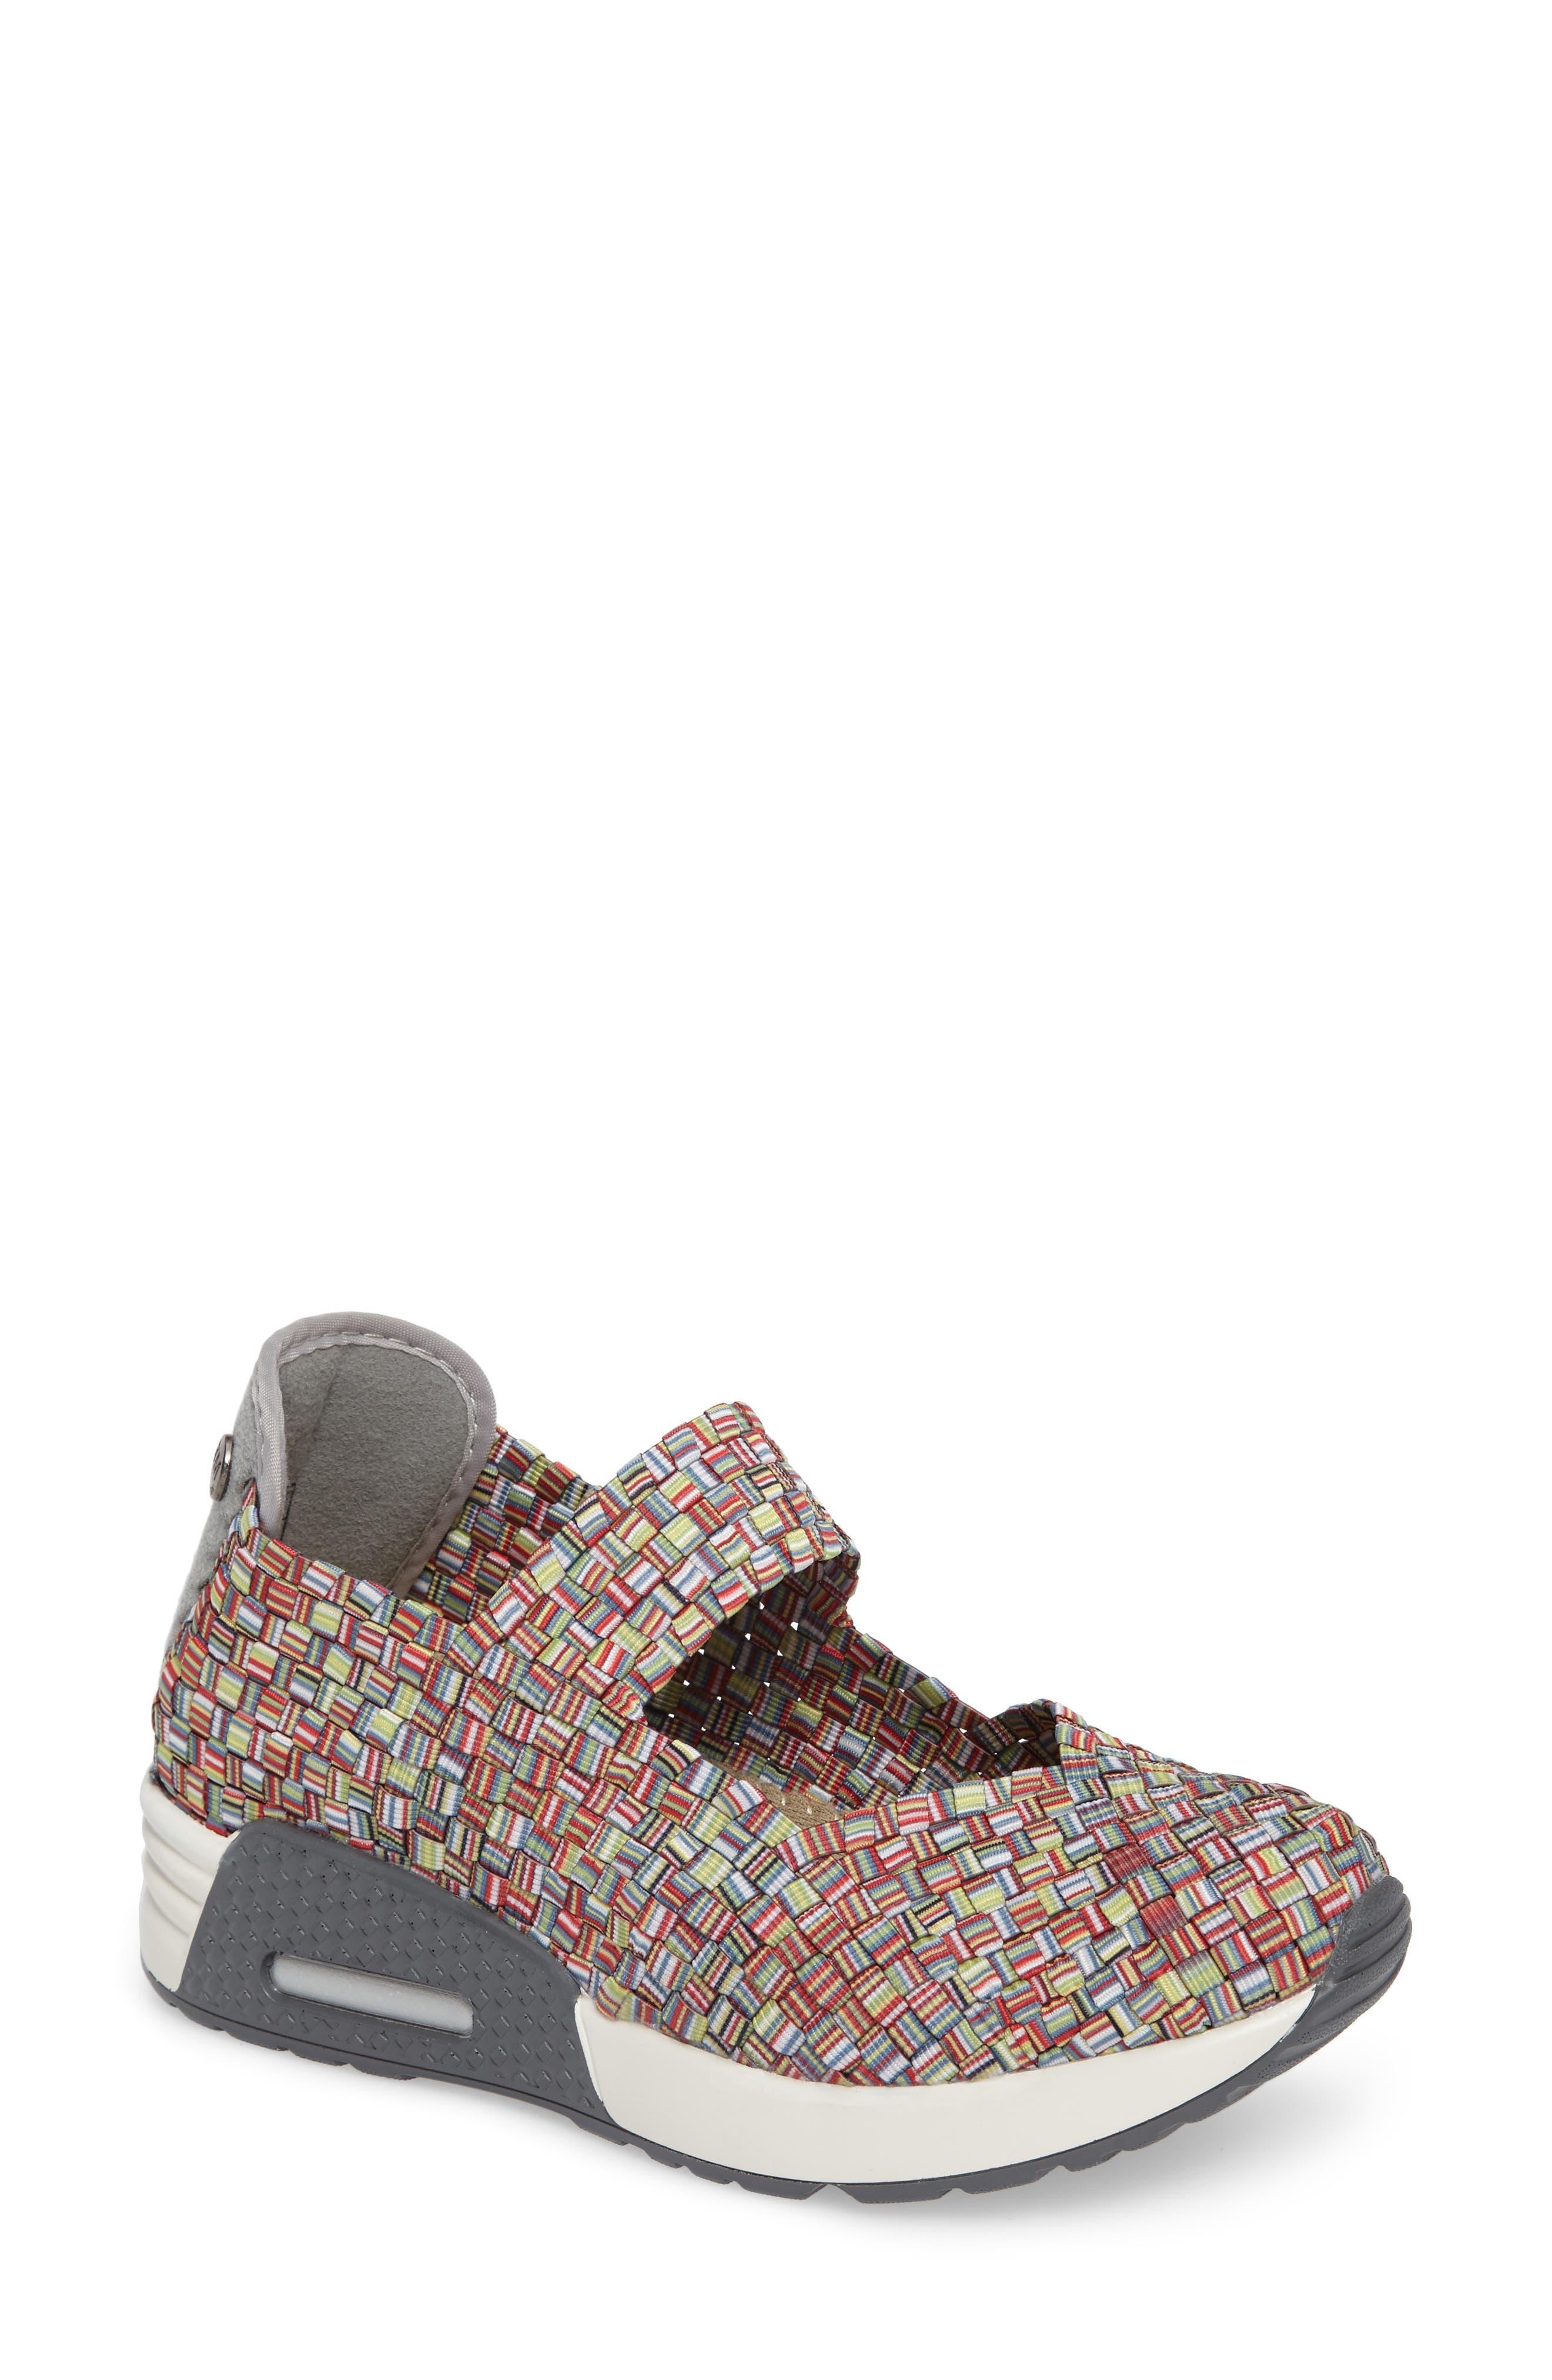 91739879c1f Bernie Mev. Best Charm Mary Jane Sneaker